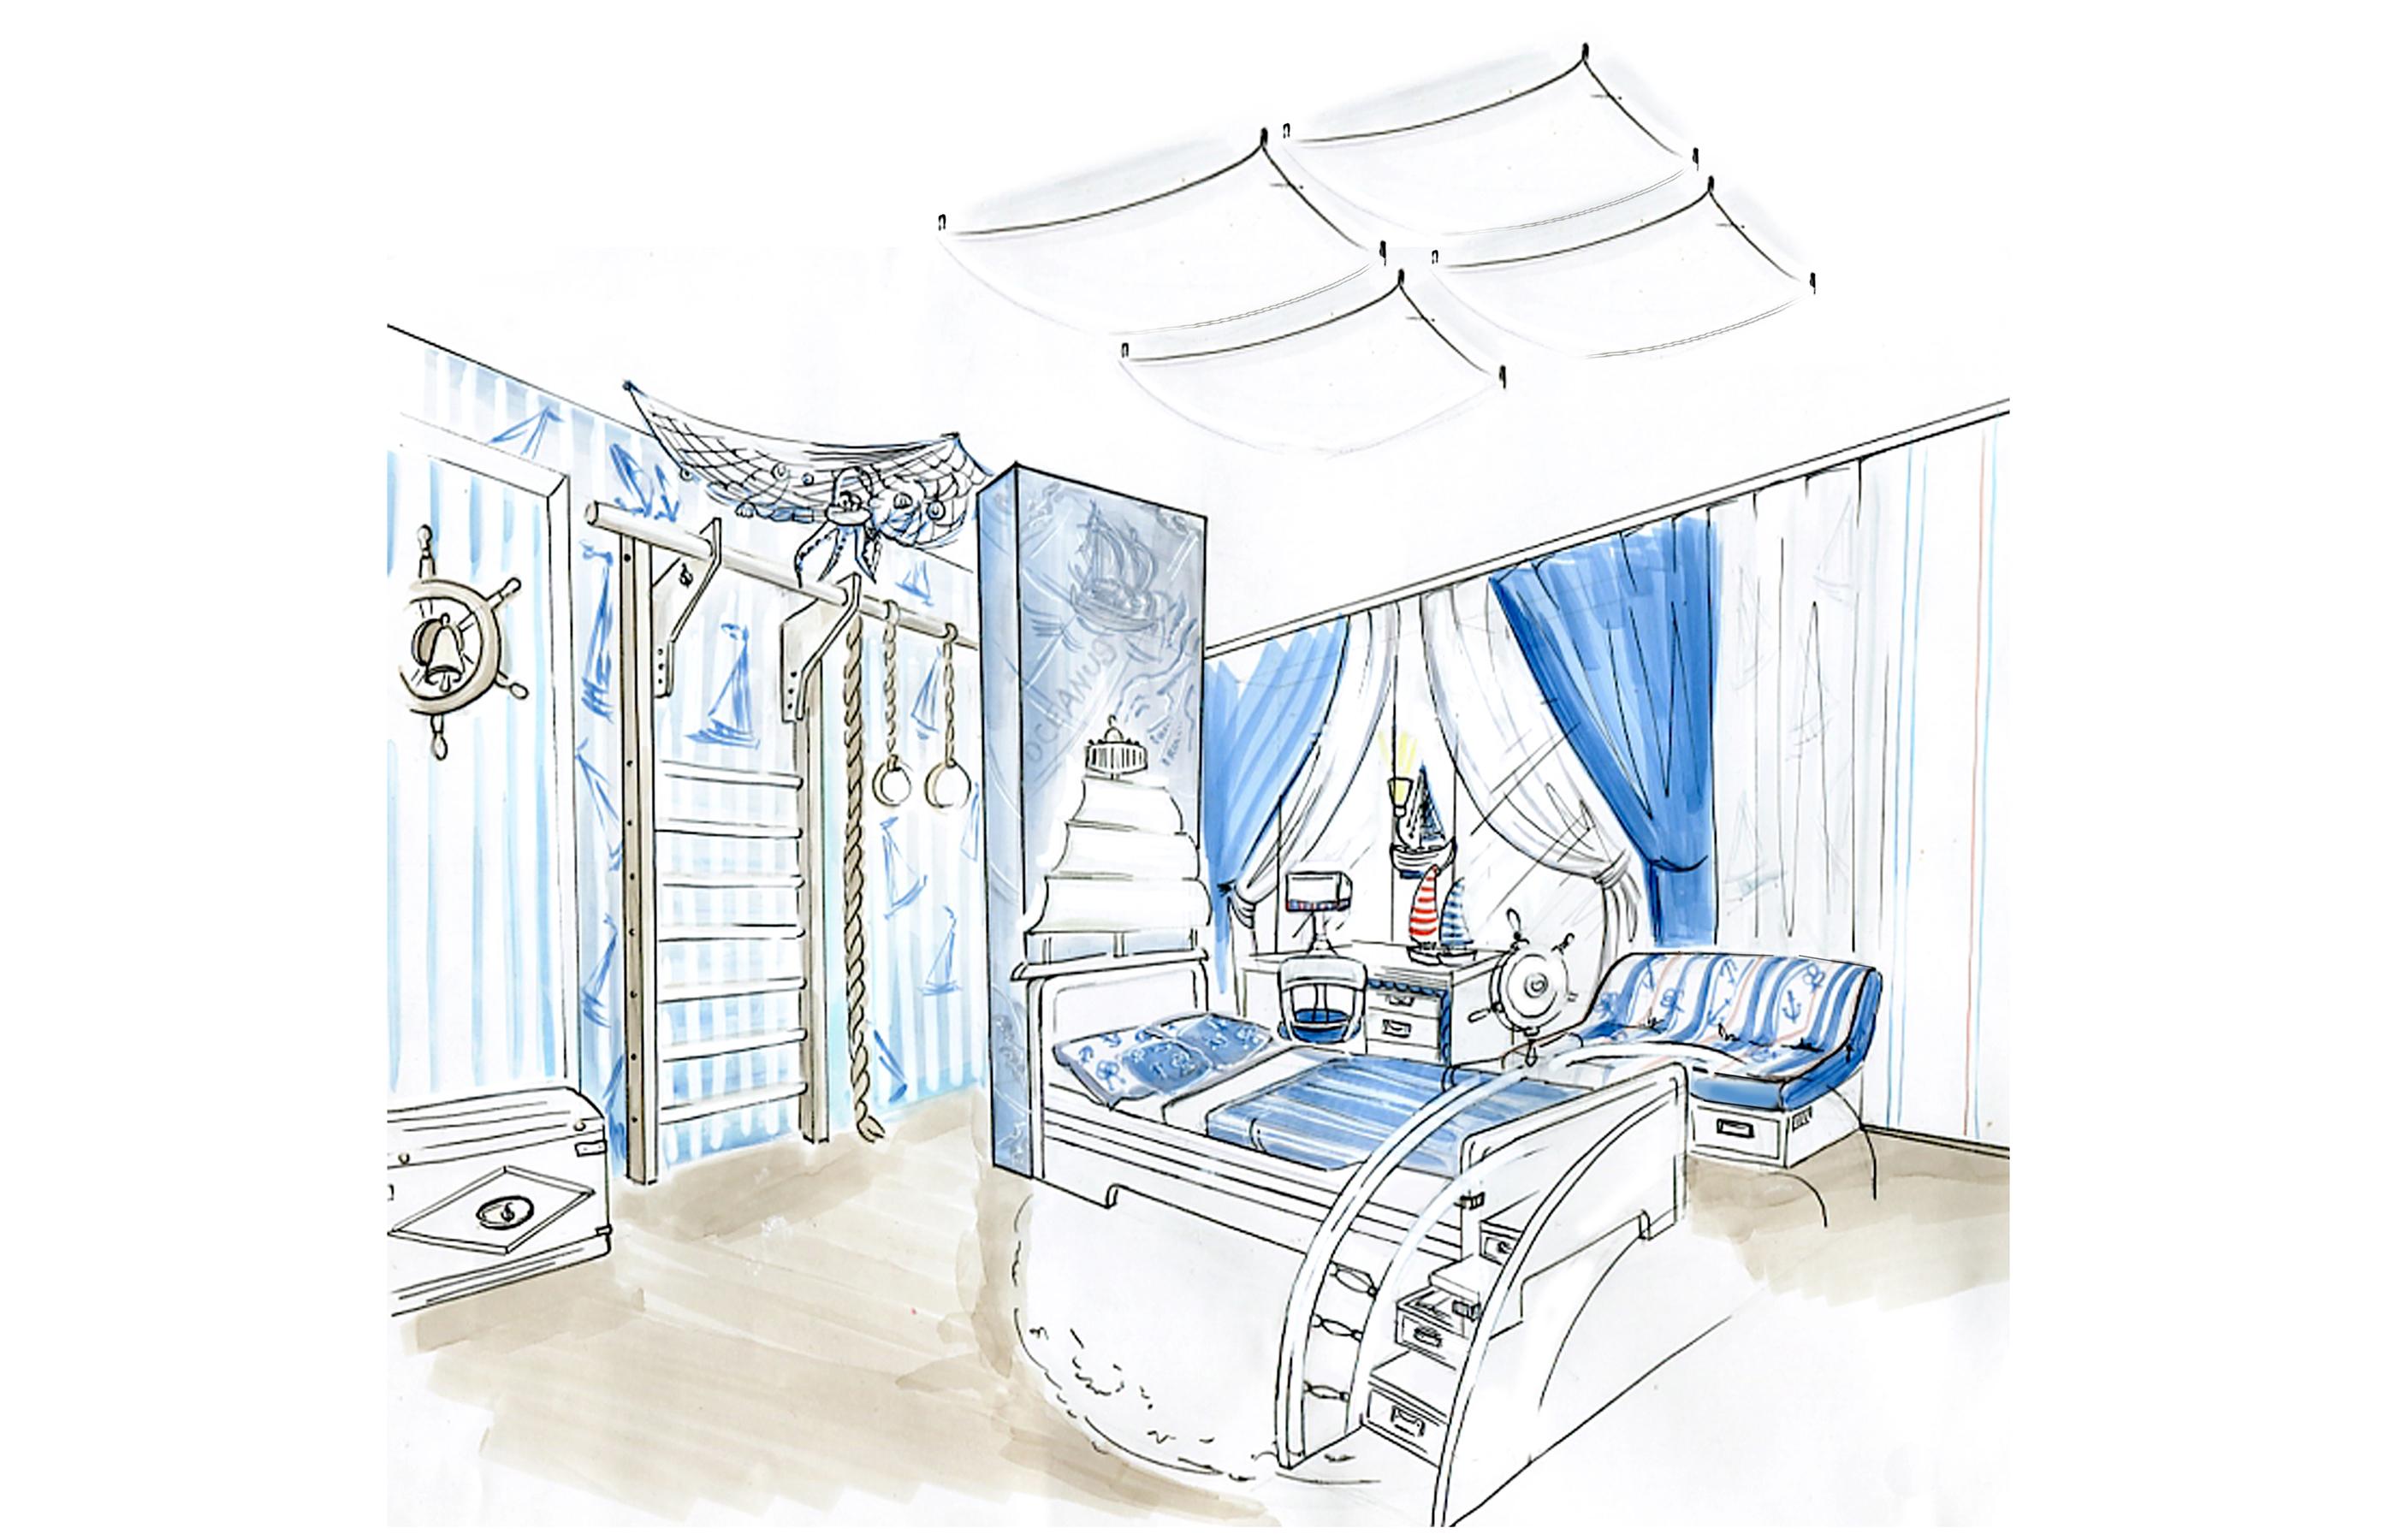 Эскиз дизайна интерьера комнаты мальчика в морском стиле